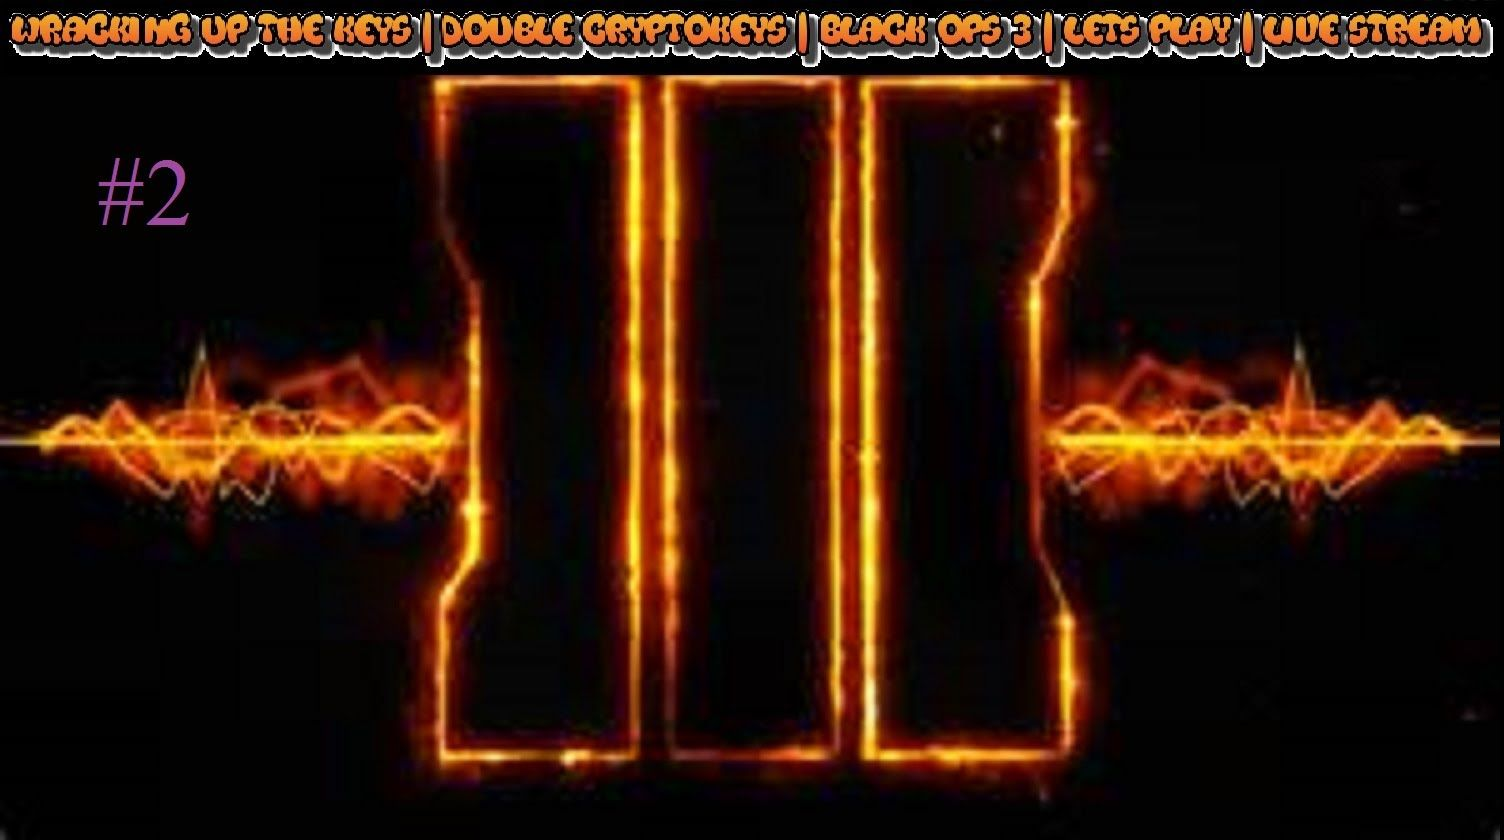 Wracking Up The Keys 2 Double Cryptokeys Black Ops 3 Lets Play Live Stream Videojuegos Imagenes De Fondo Call Of Duty